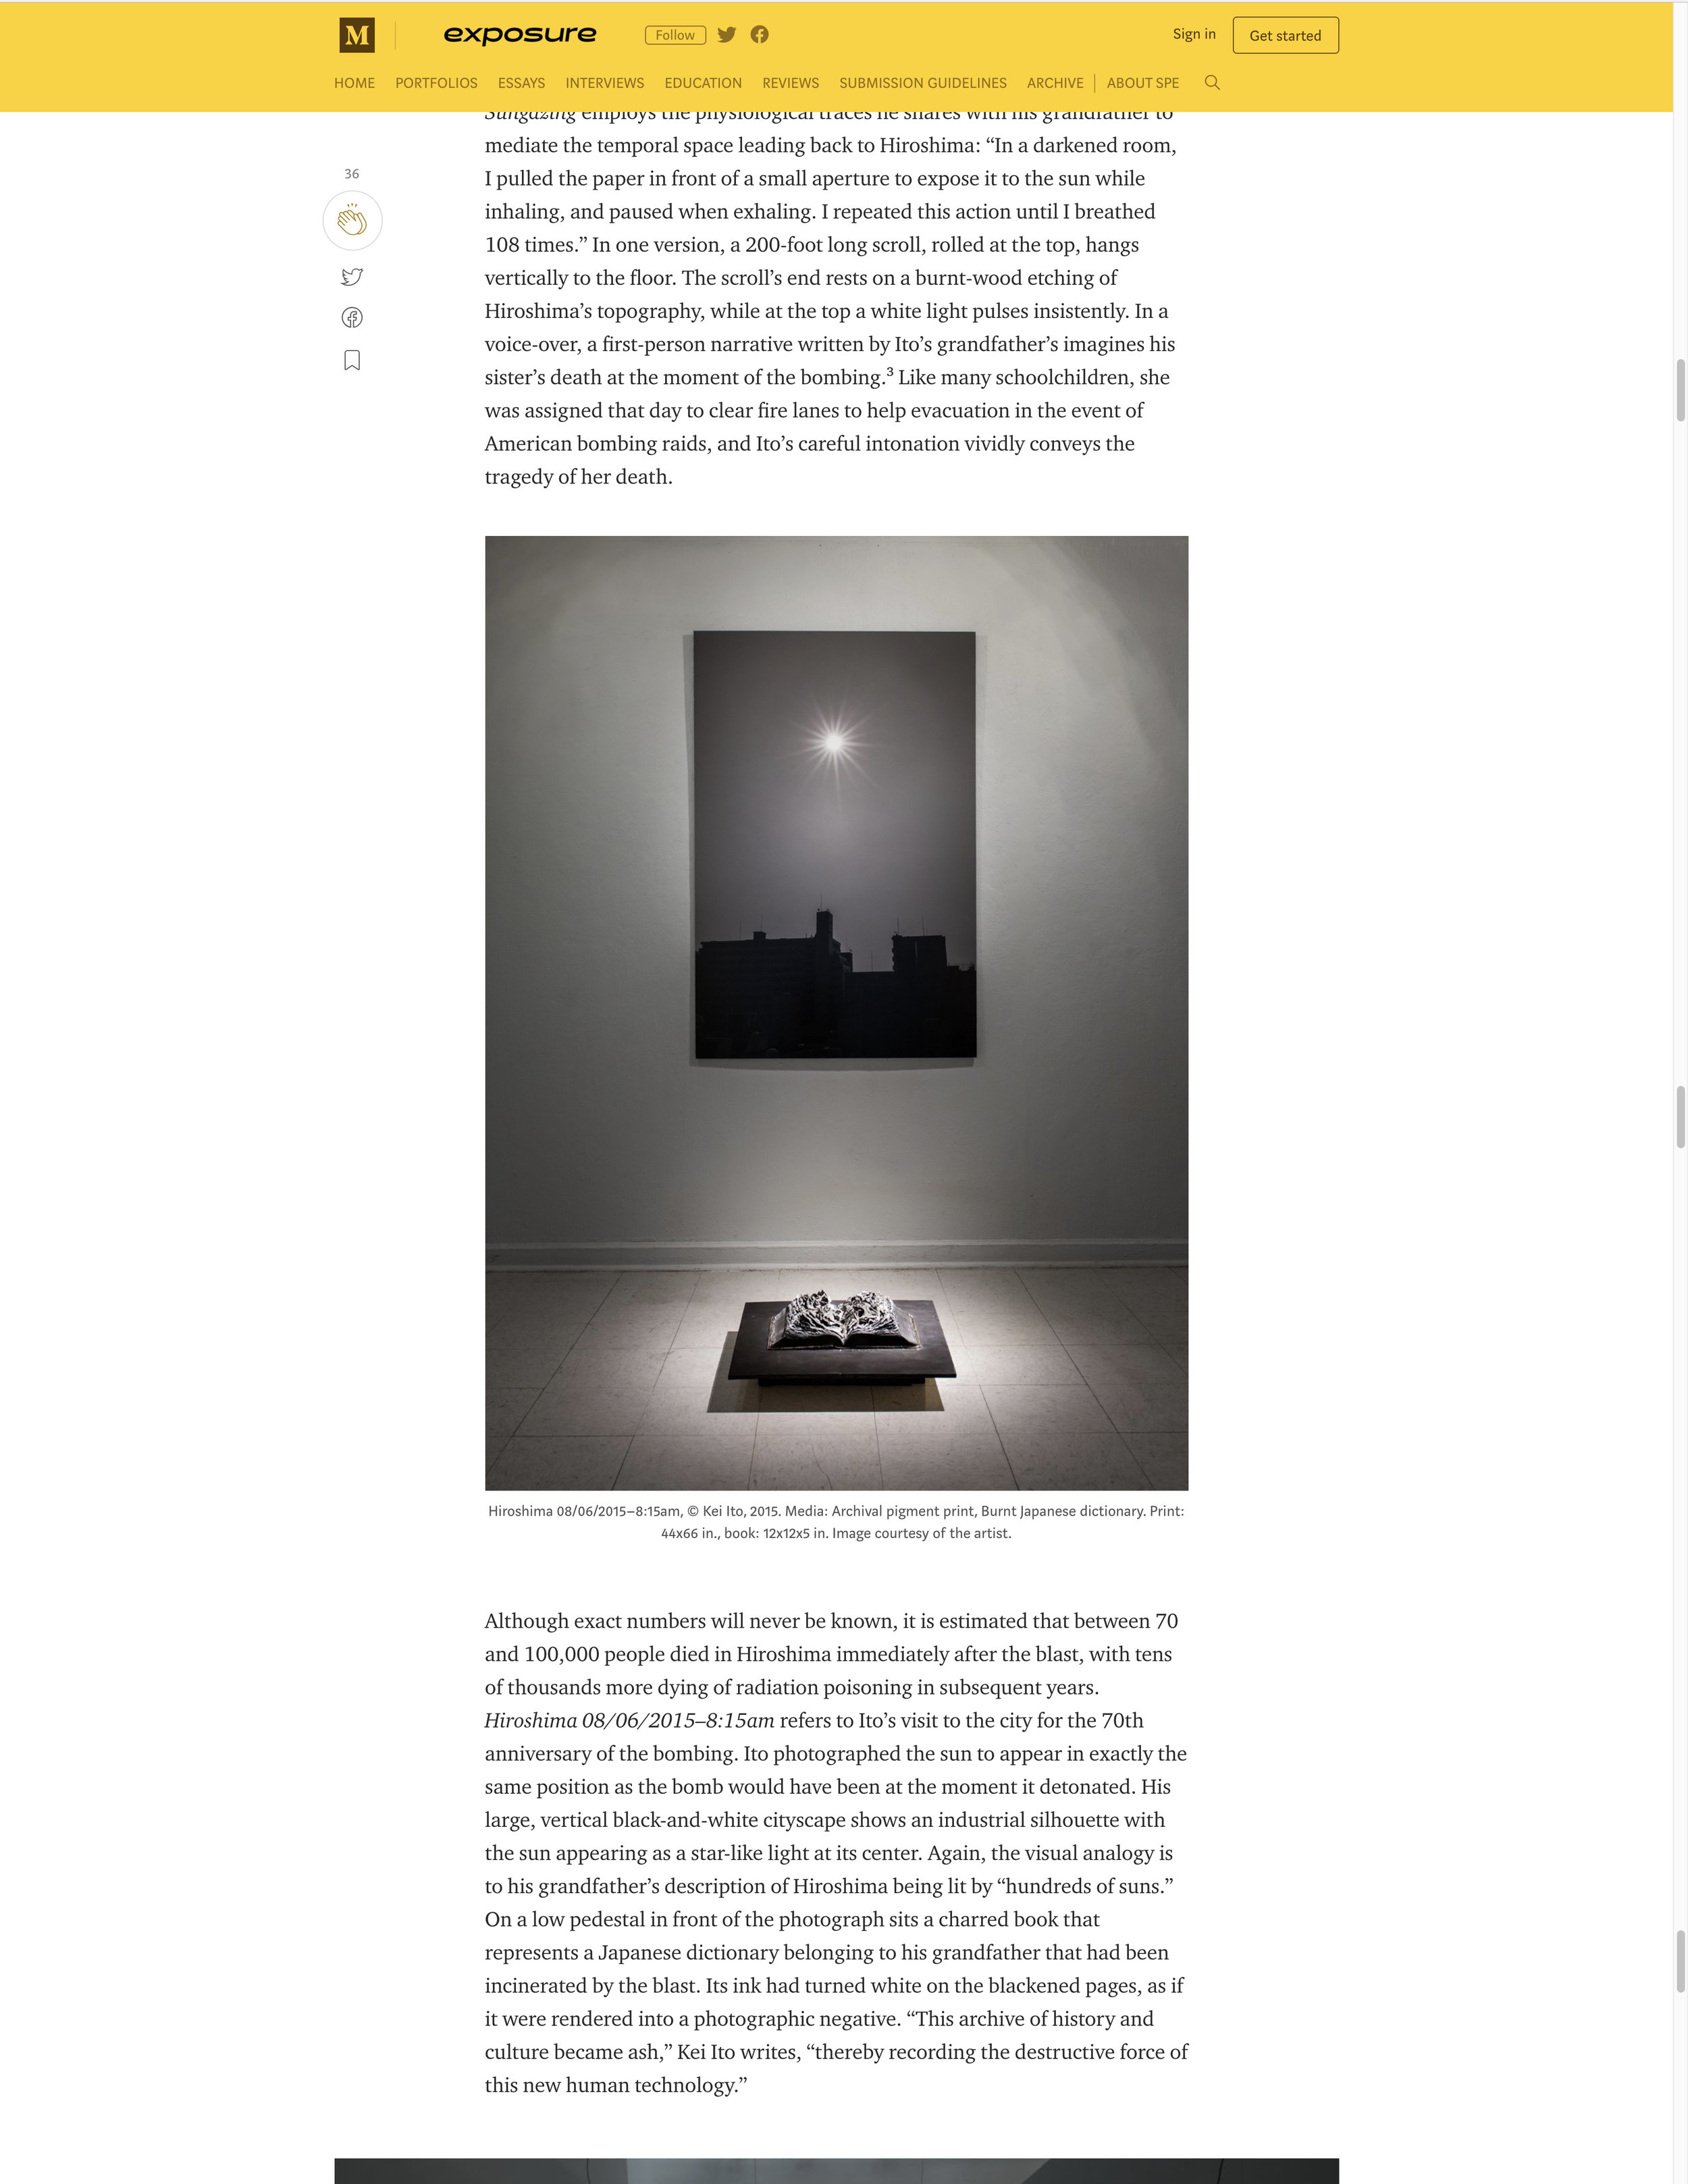 Article published on 09/12/2018   https://medium.com/exposure-magazine/art-of-atomic-legacy-the-work-of-kei-ito-b311735912e6